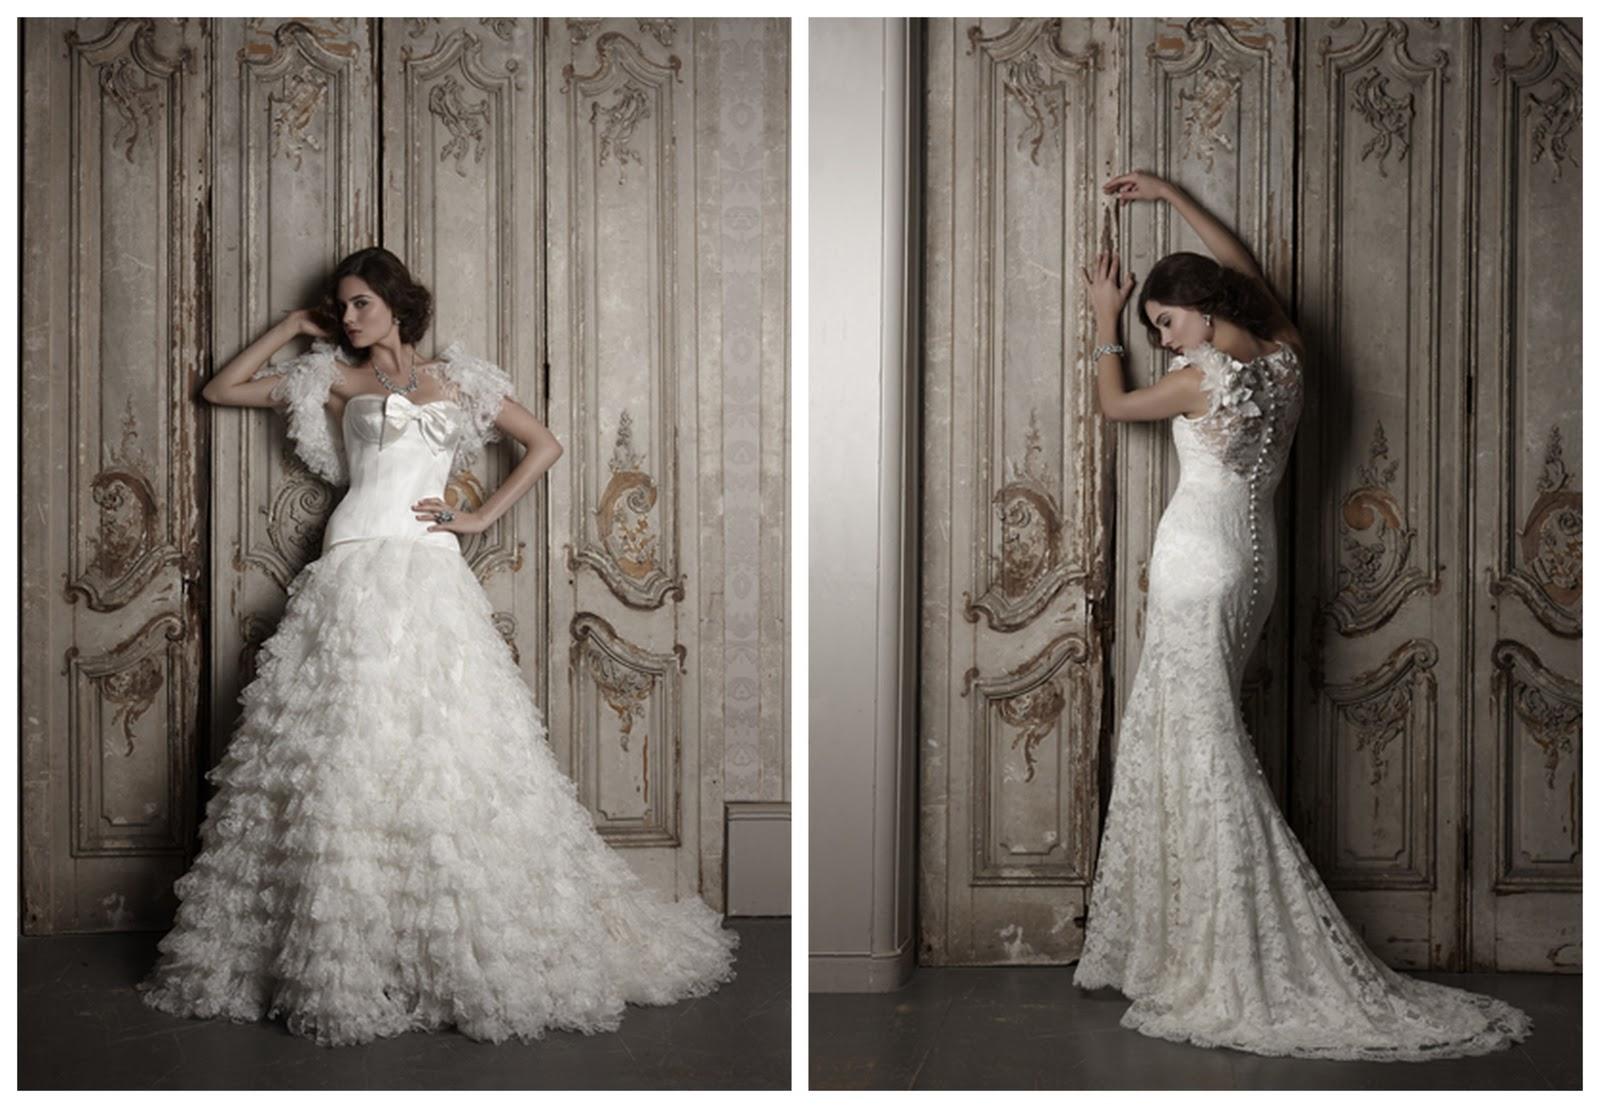 Cheap Wedding Dresses wedding dress sale Spaghetti Strap Beading A Line Court Train Long Sleeves Wedding Dress